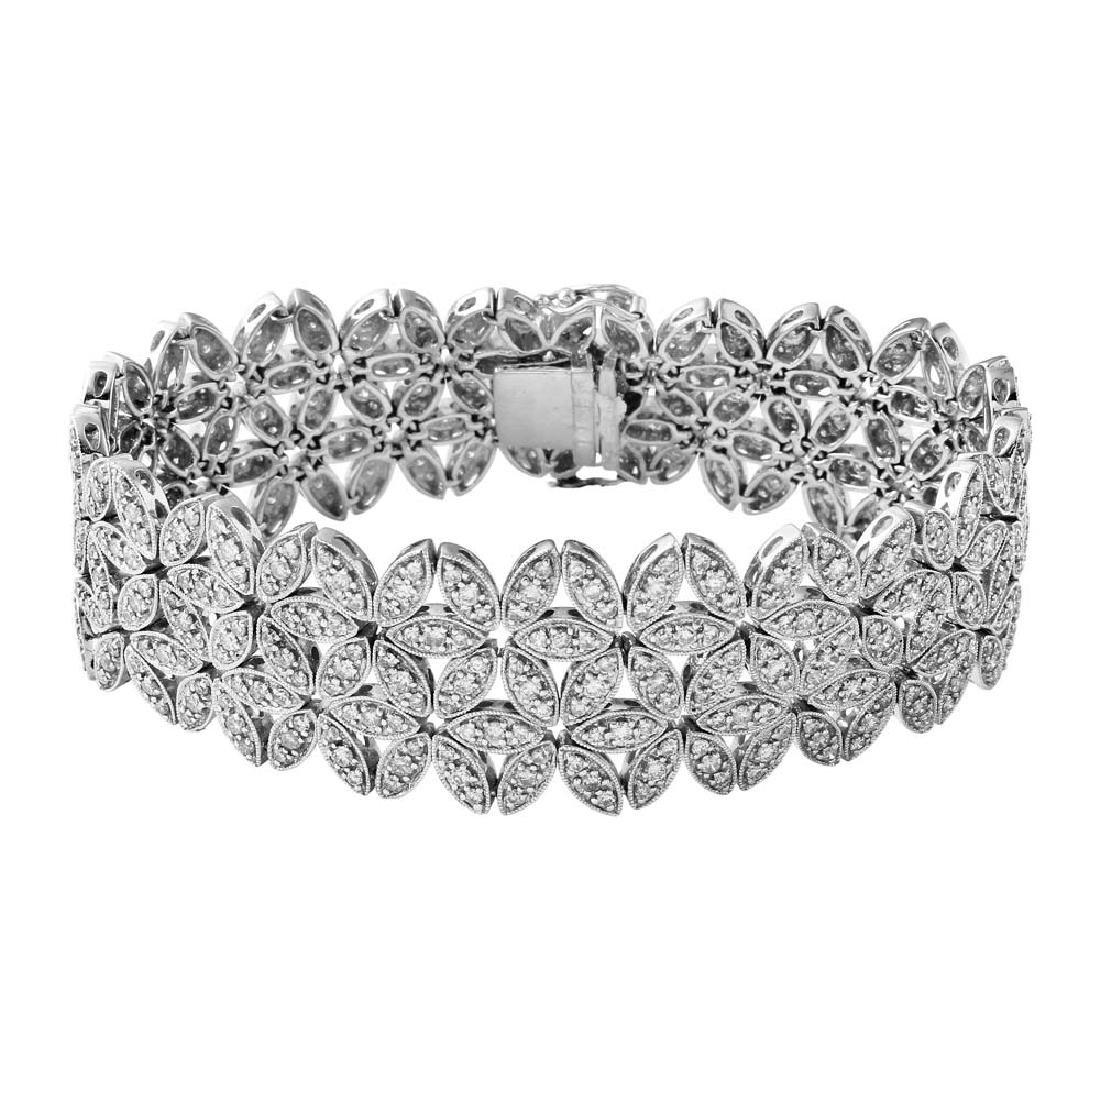 Genuine 6.23 TCW 14K White Gold Ladies Bracelet